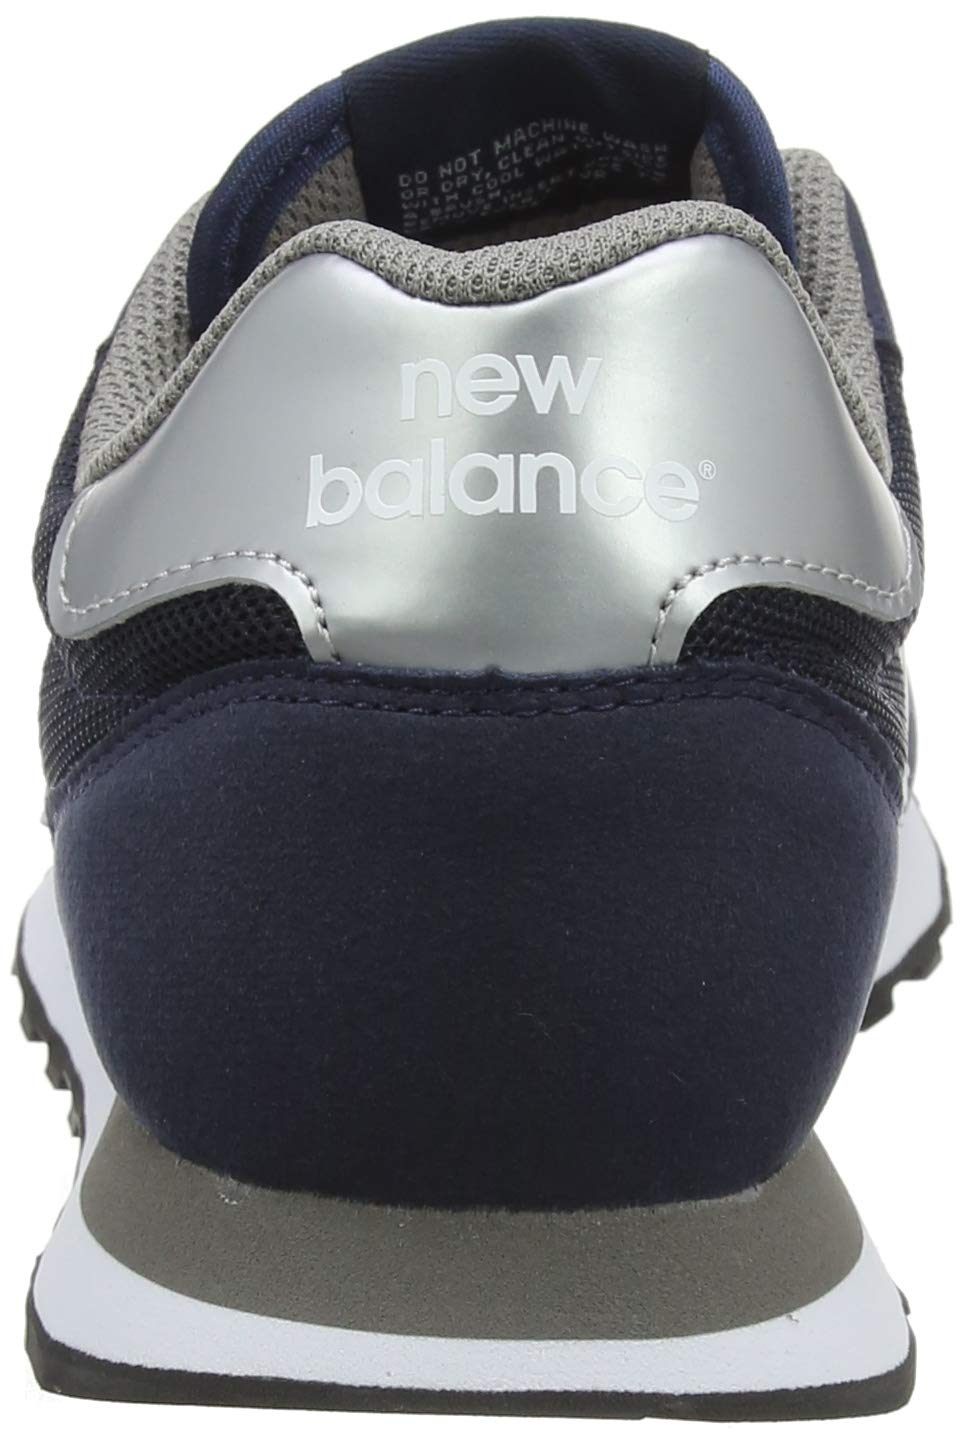 scarpe new balance uomo 500